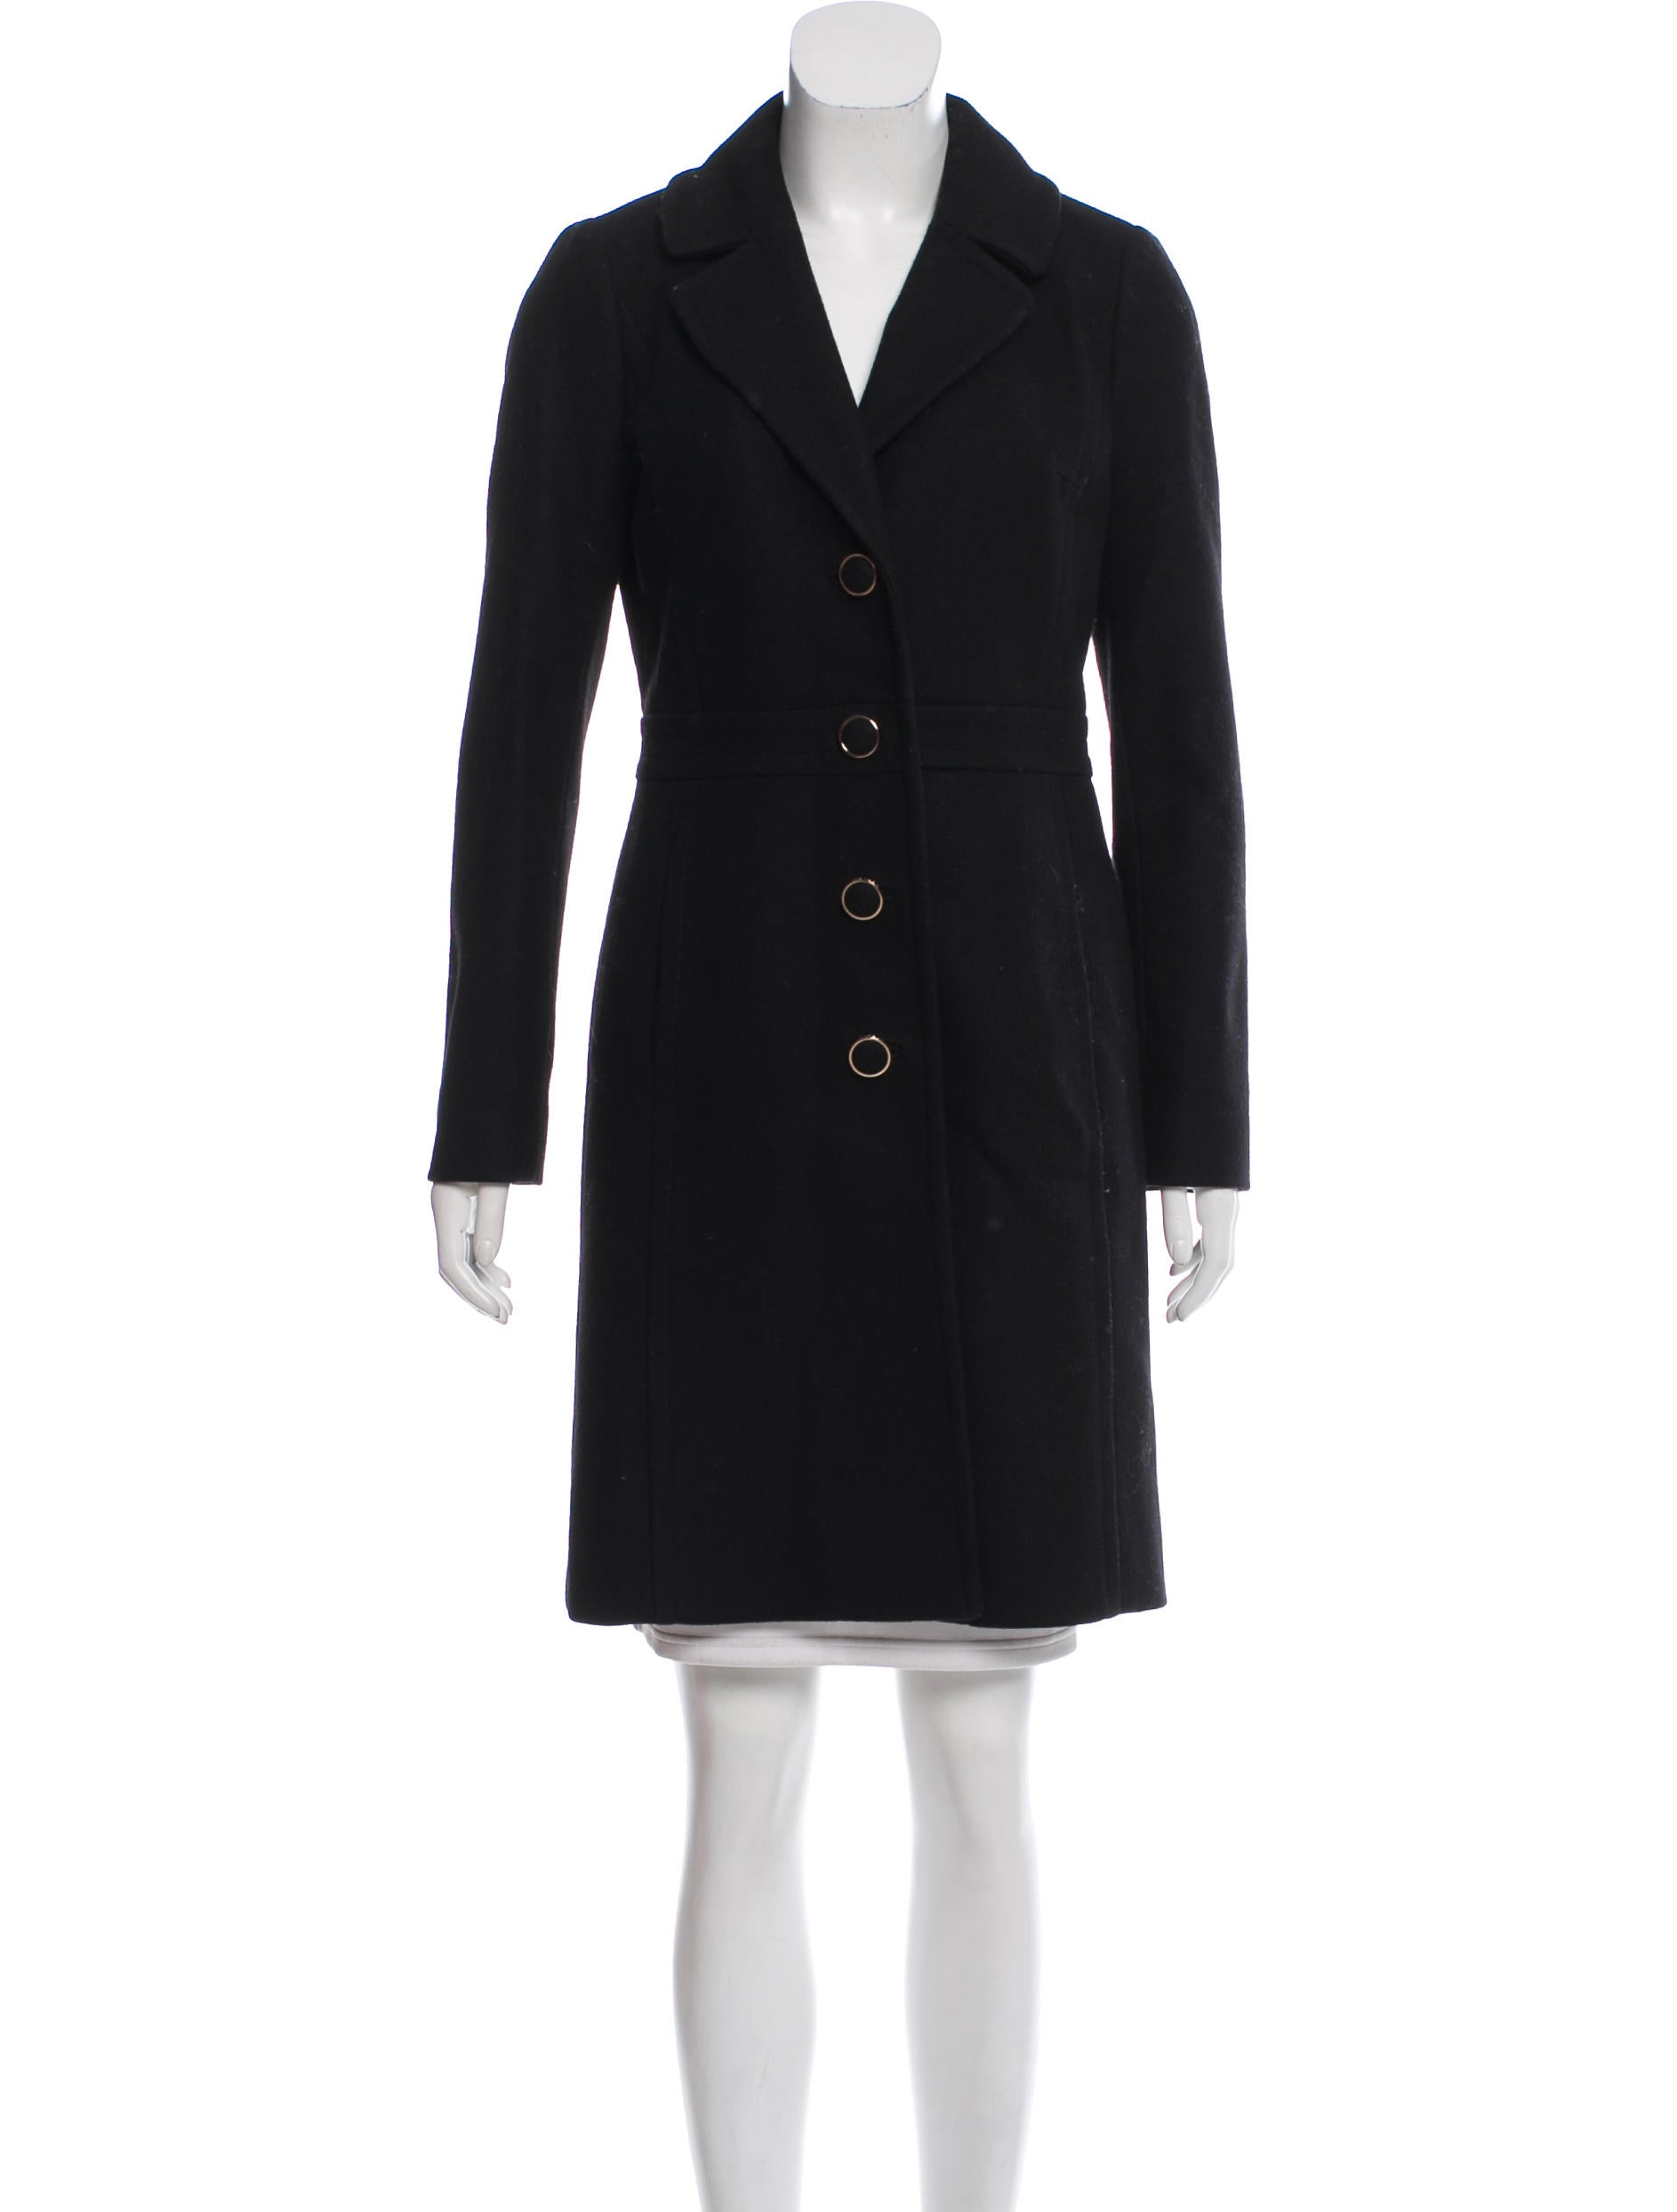 Elegant Womenu0026#39;s Breton Pea Coat For Ladies Navy Blue Wool - THE NAUTICAL COMPANY UK